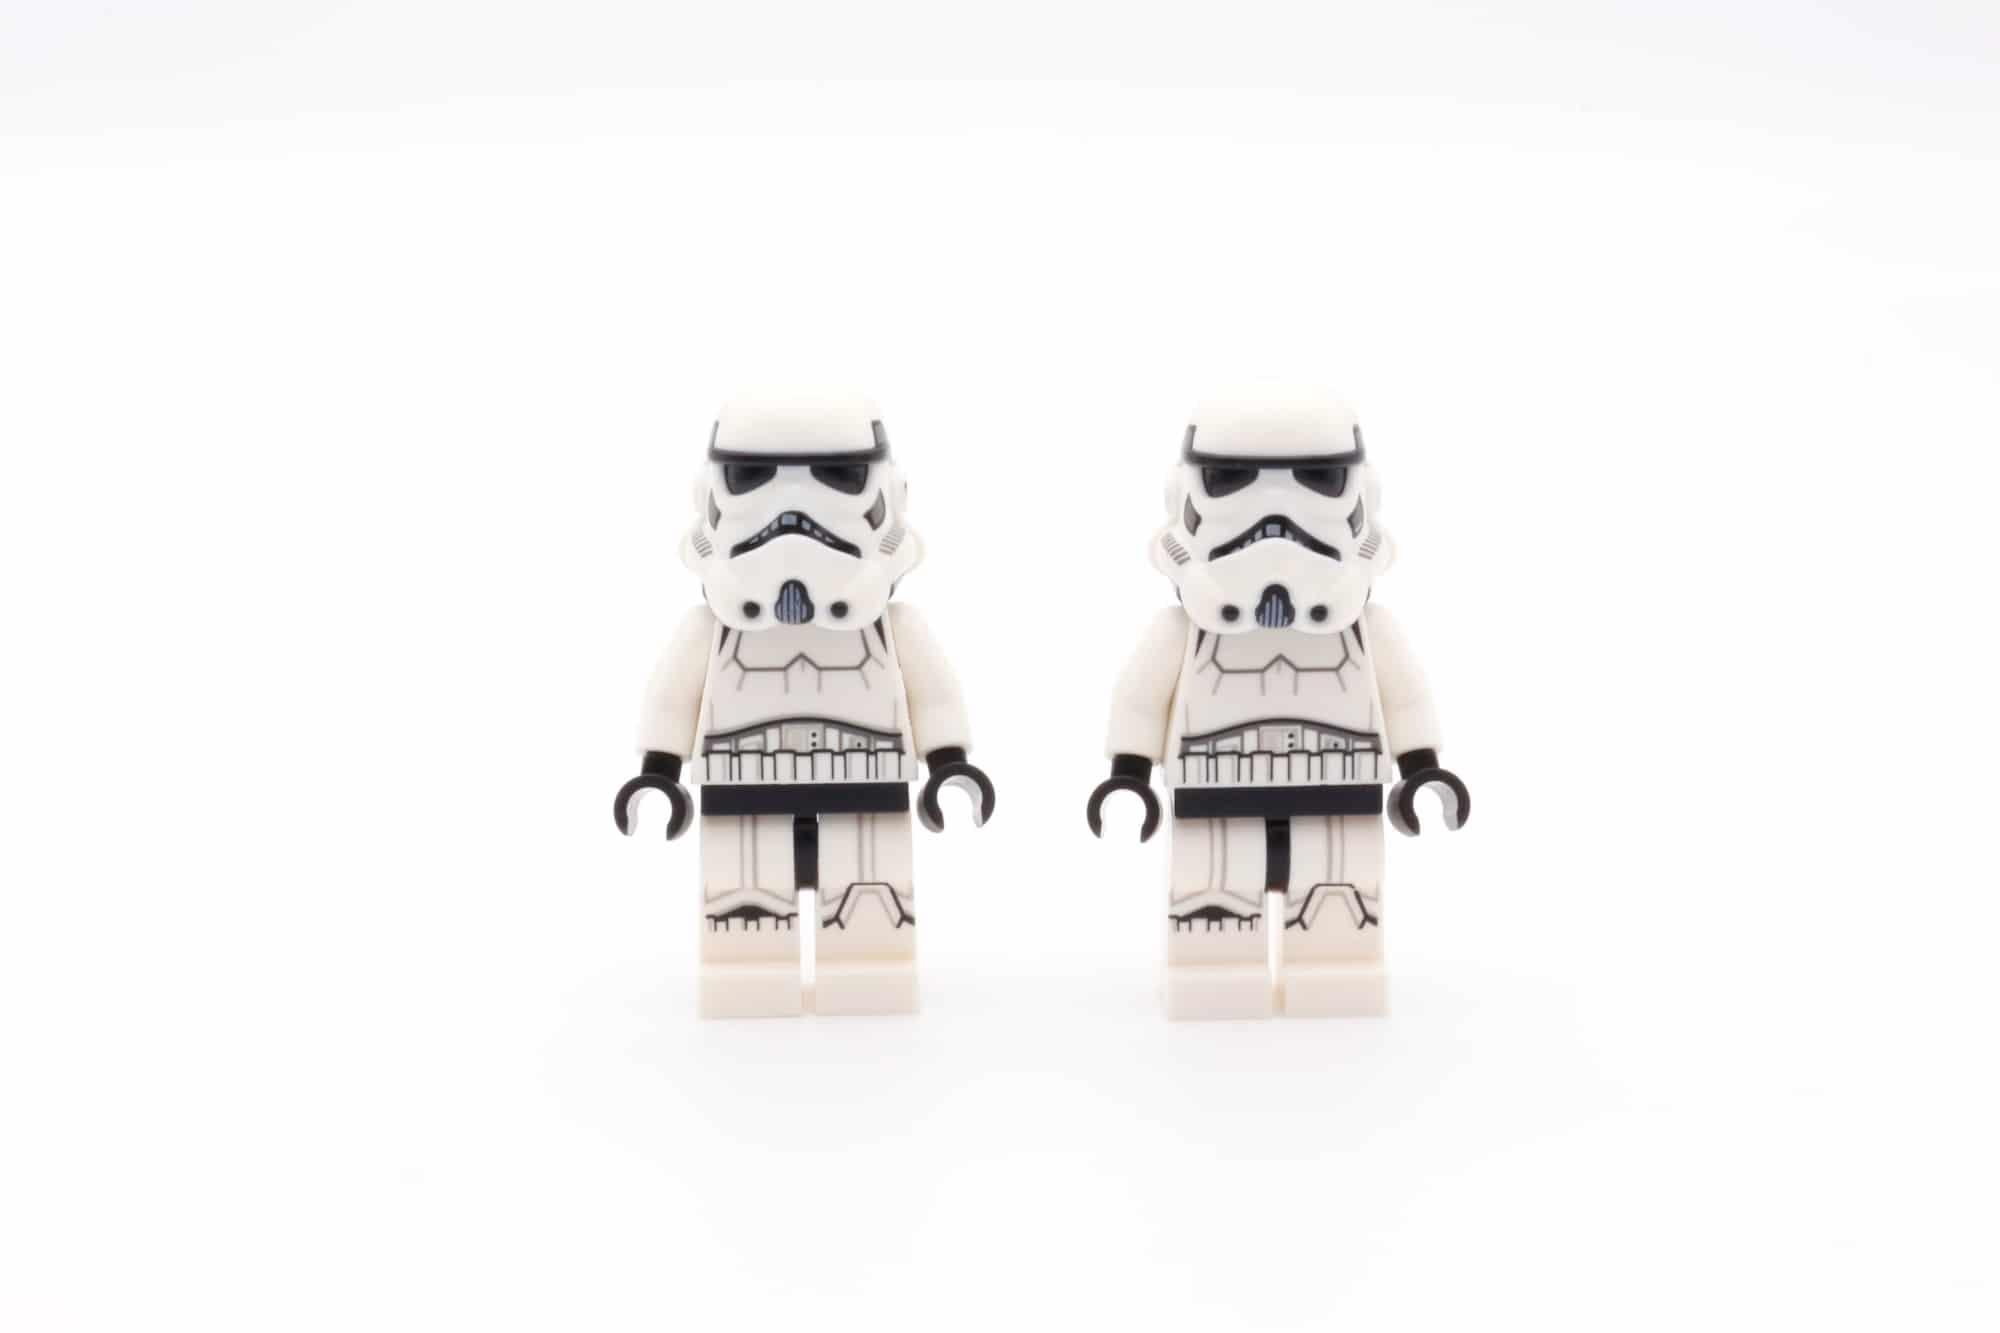 LEGO Star Wars 75311 Imperial Marauder Stormtroopers Front Helmet